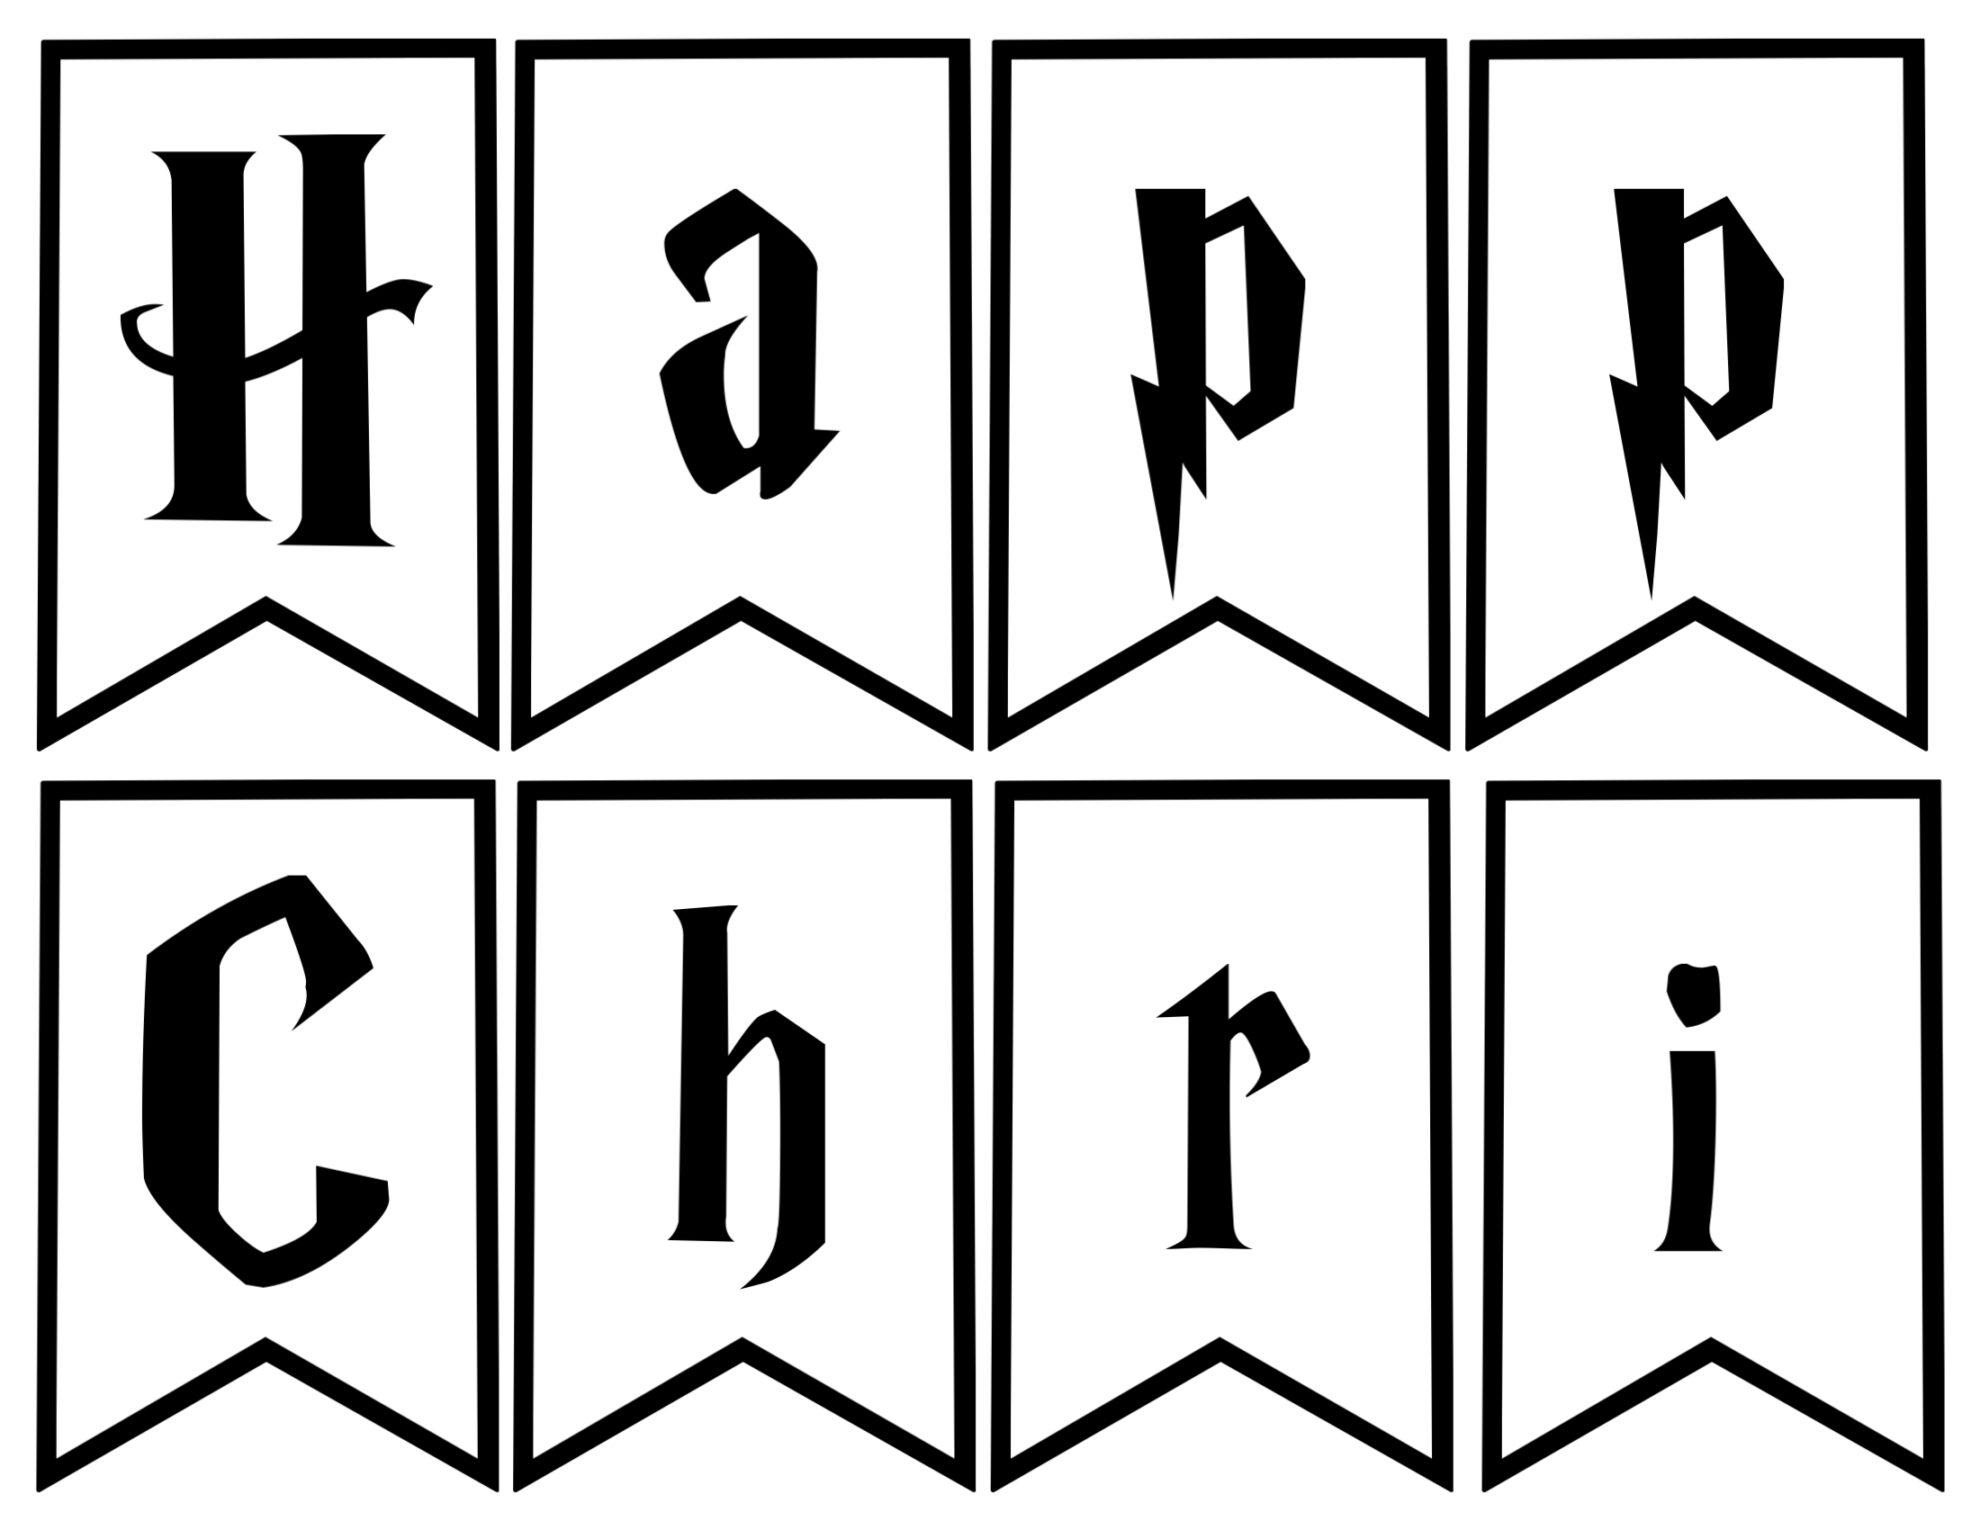 Harry Potter Christmas Decor Banner - Paper Trail Design